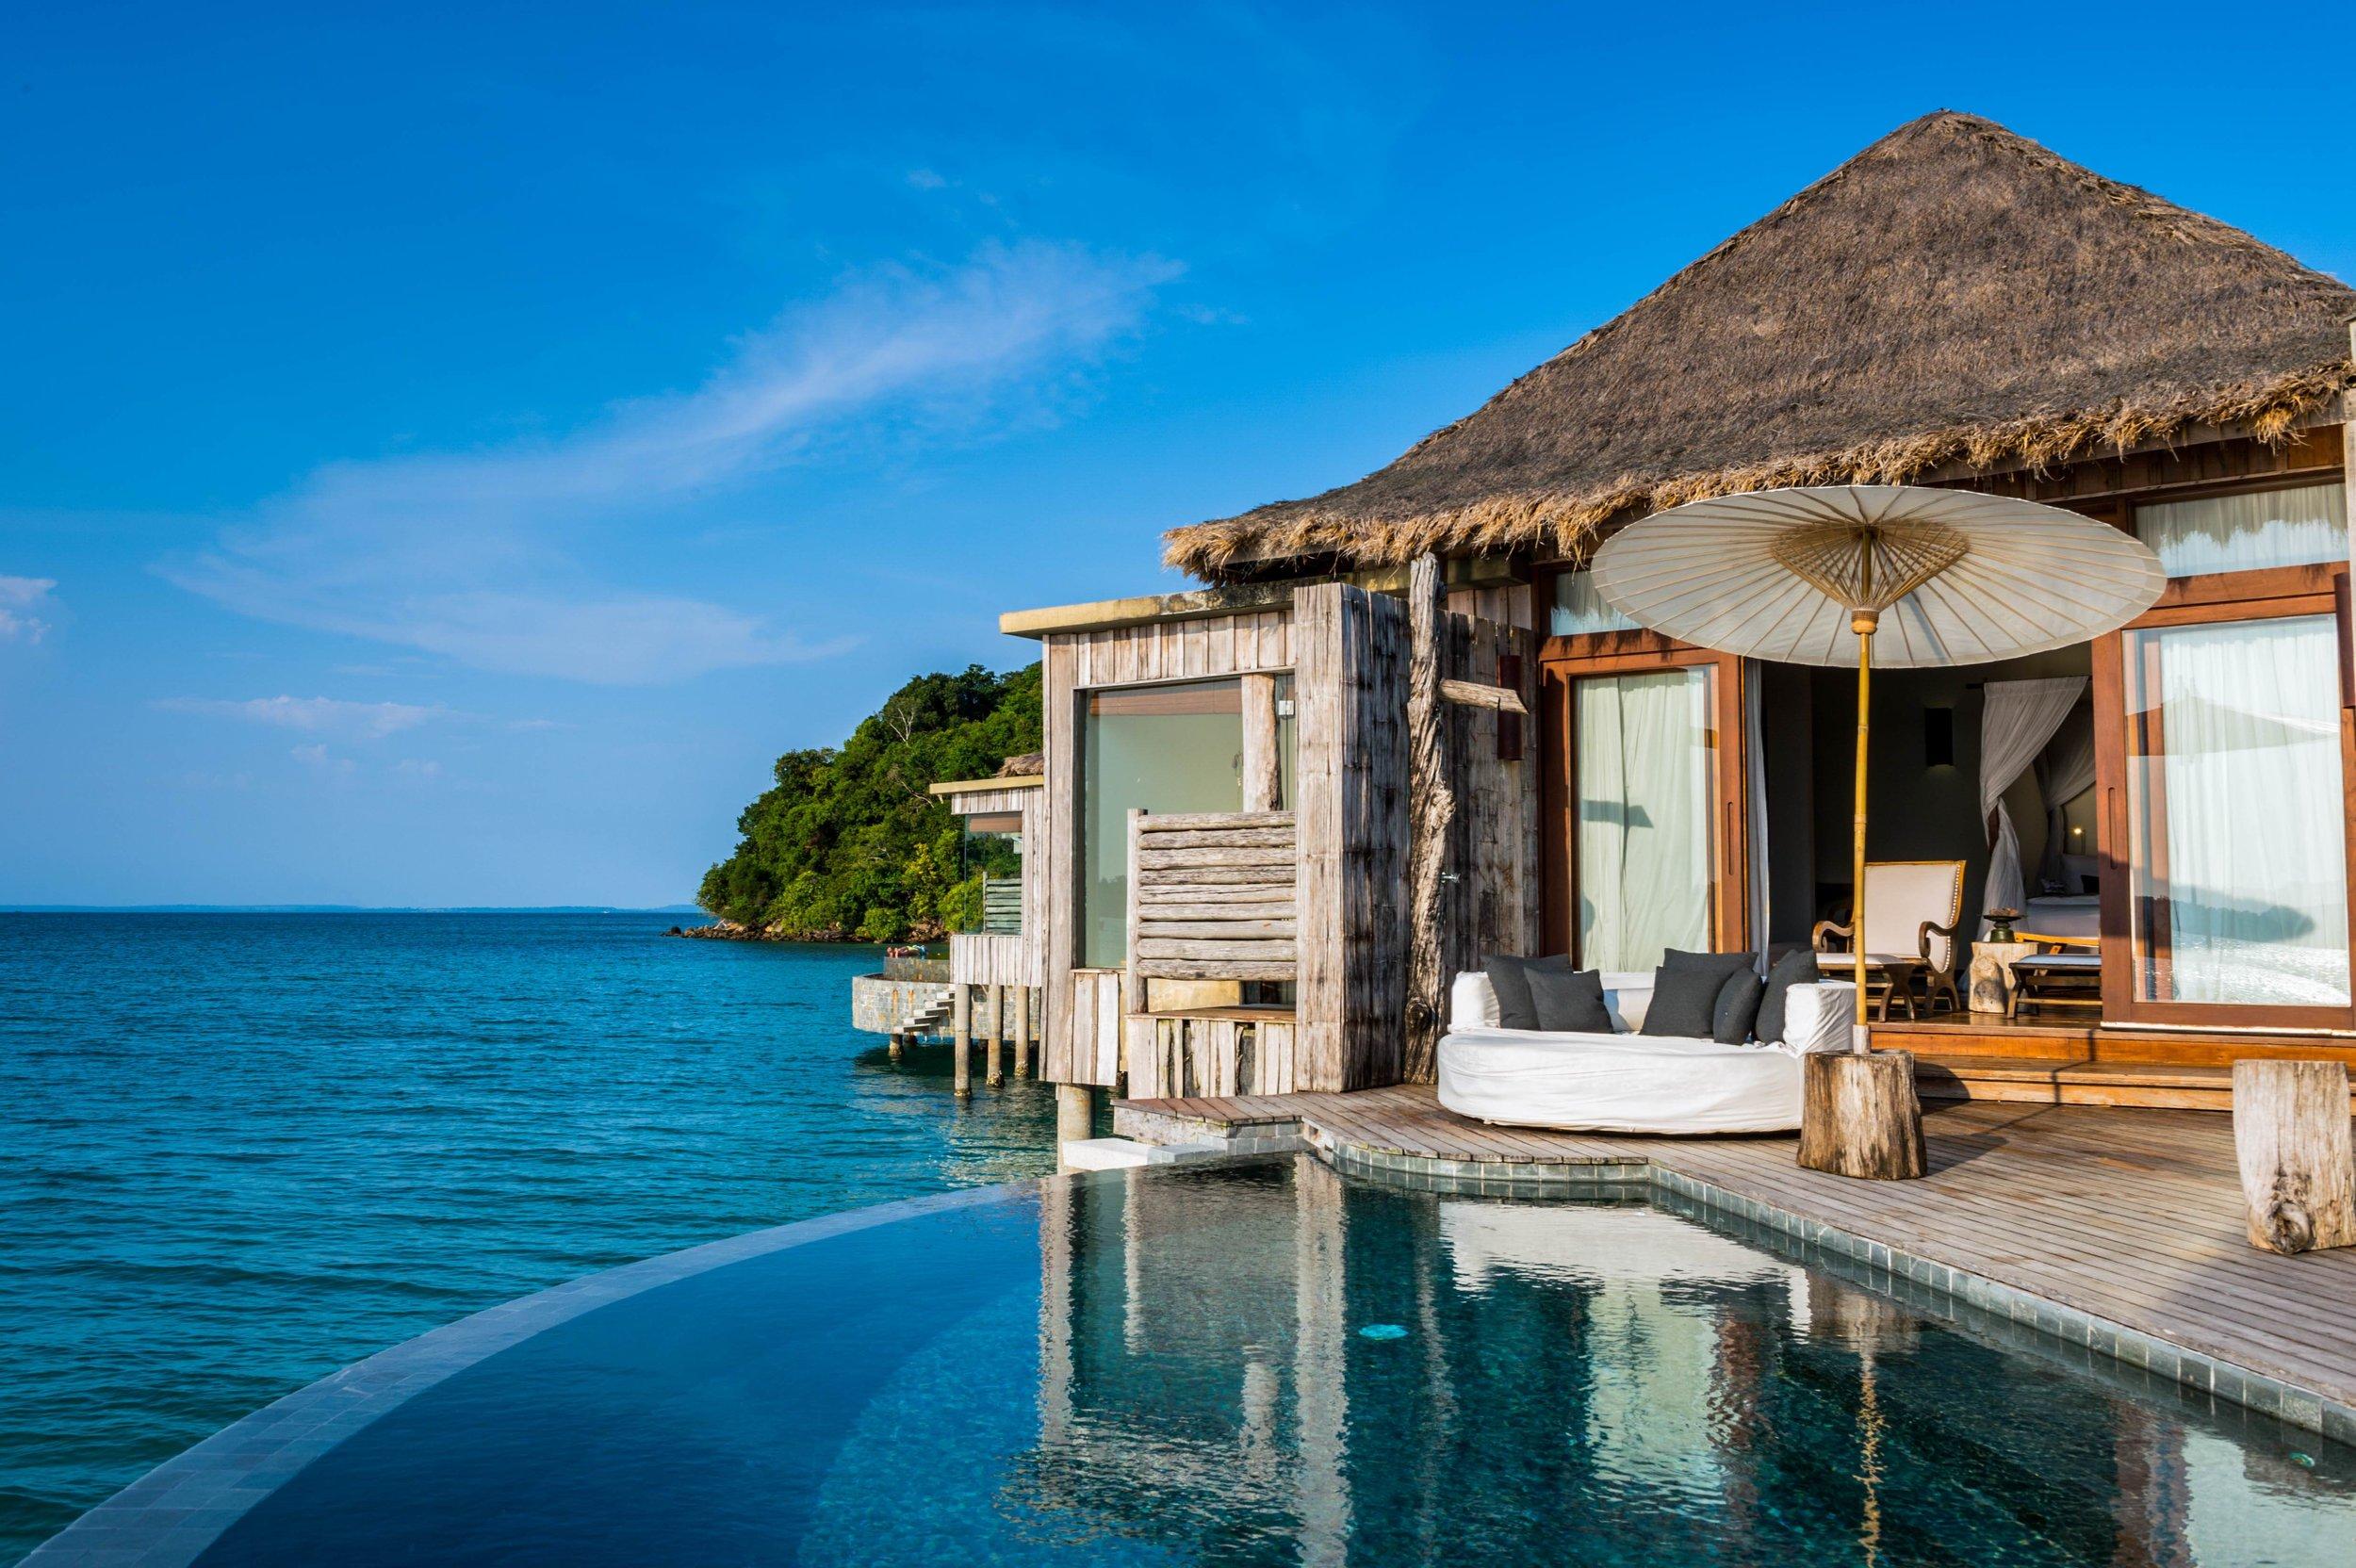 Reto-Guntli-overwater-villa-interior-song-saa-private-island-2015-8-2.jpg